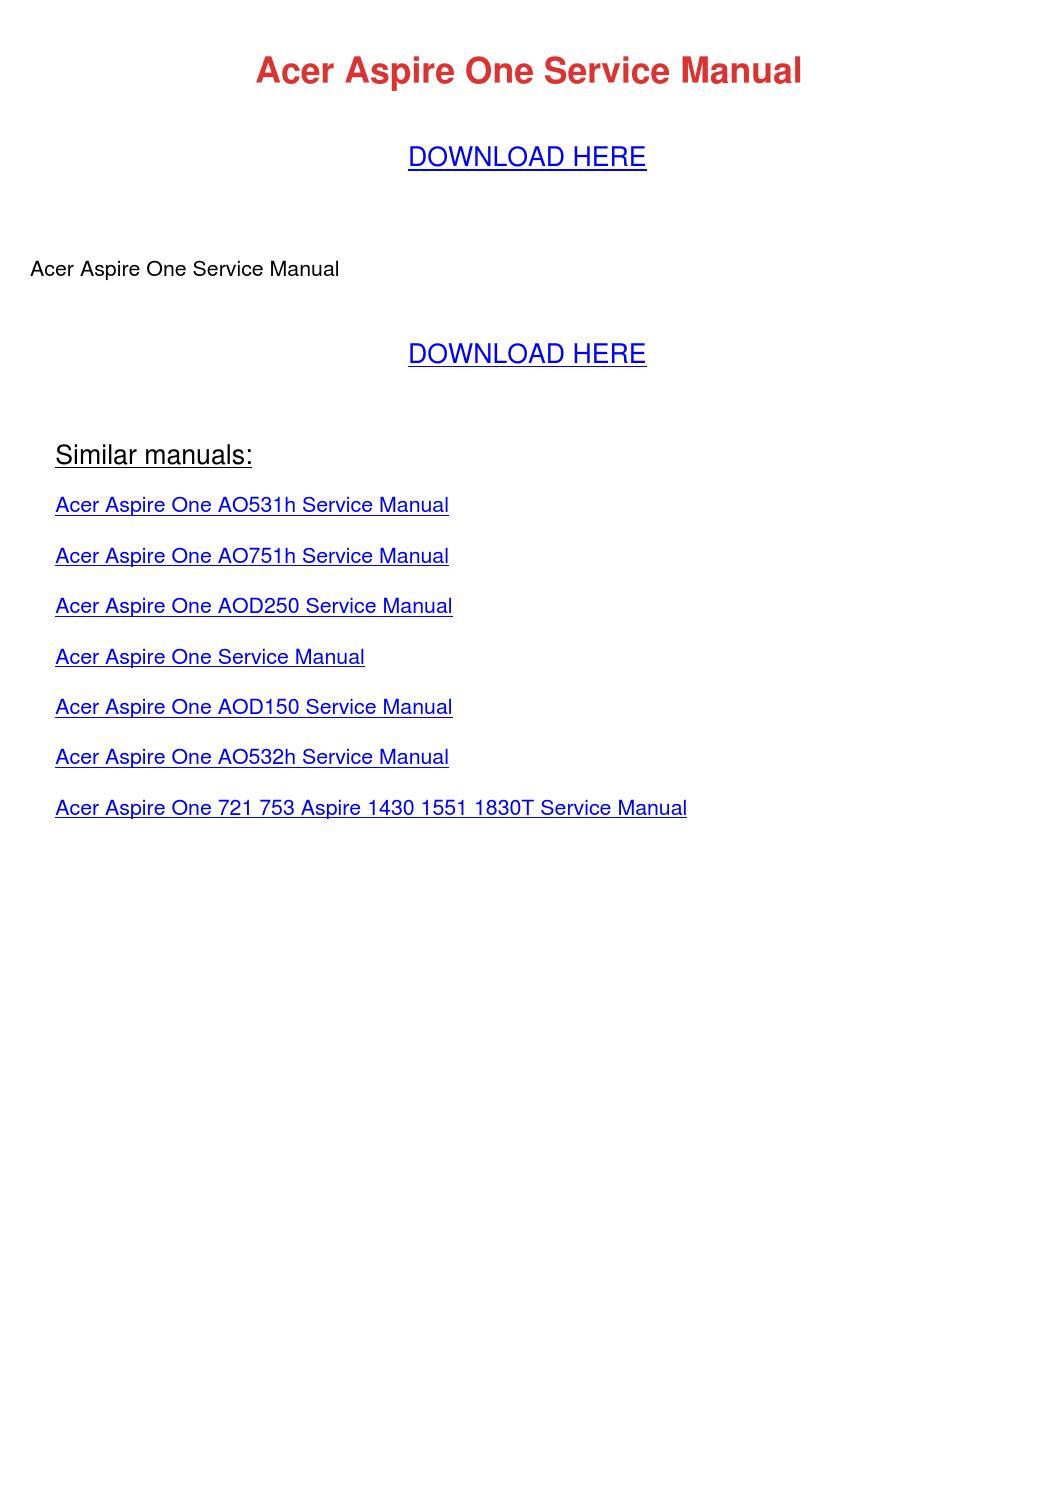 Acer Aspire One Service Manual by JasminHagen - issuu